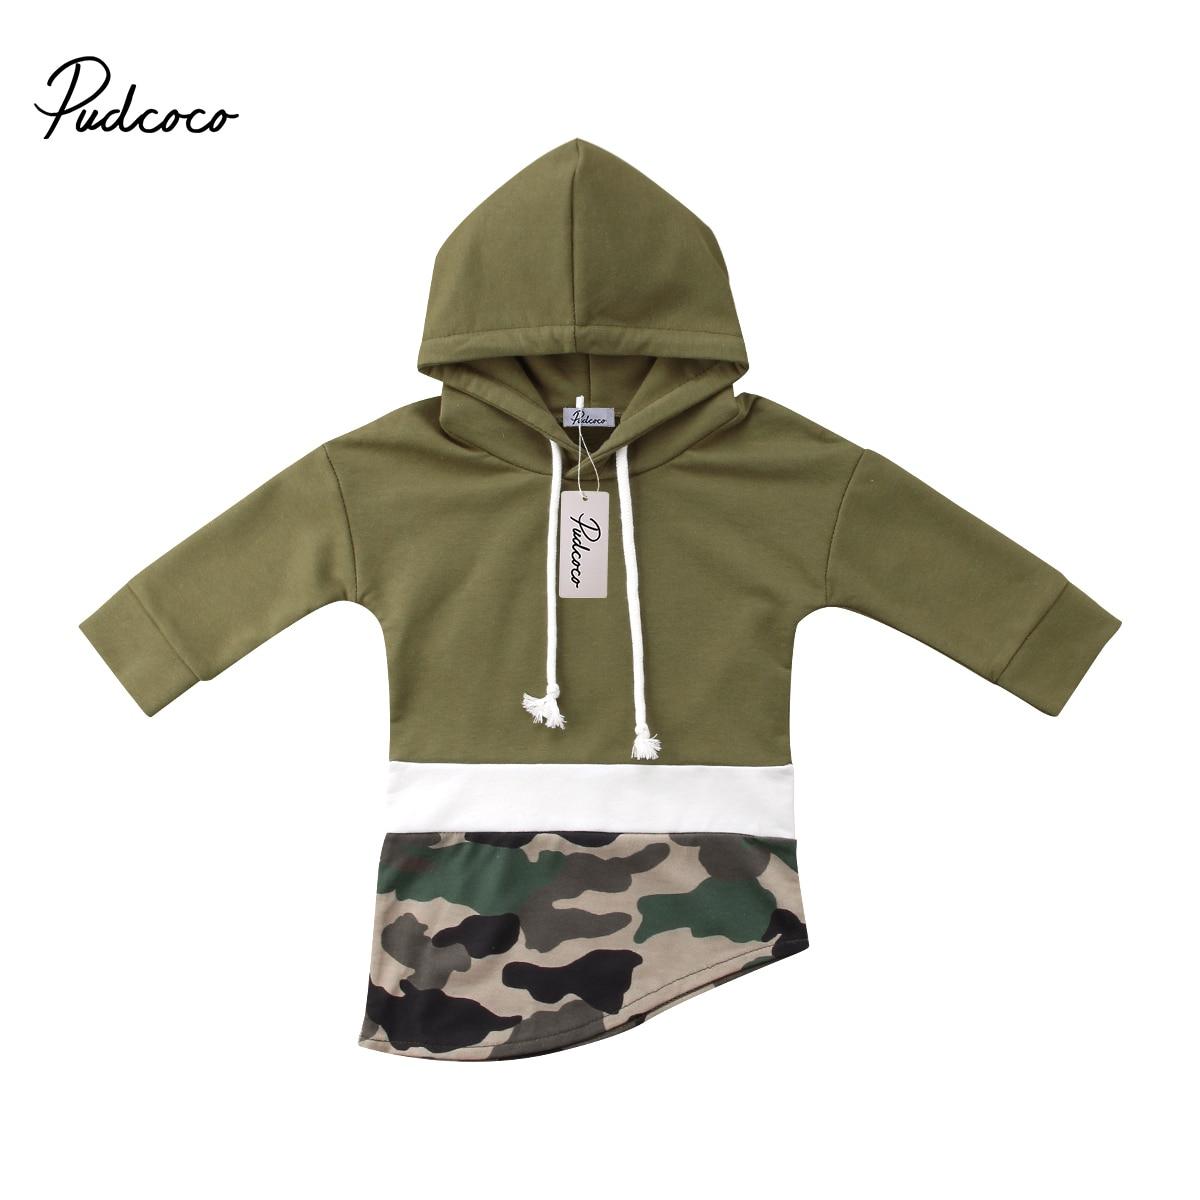 Buy kids camouflage sweatshirts and get free shipping on AliExpress.com d5eafa8eaa11